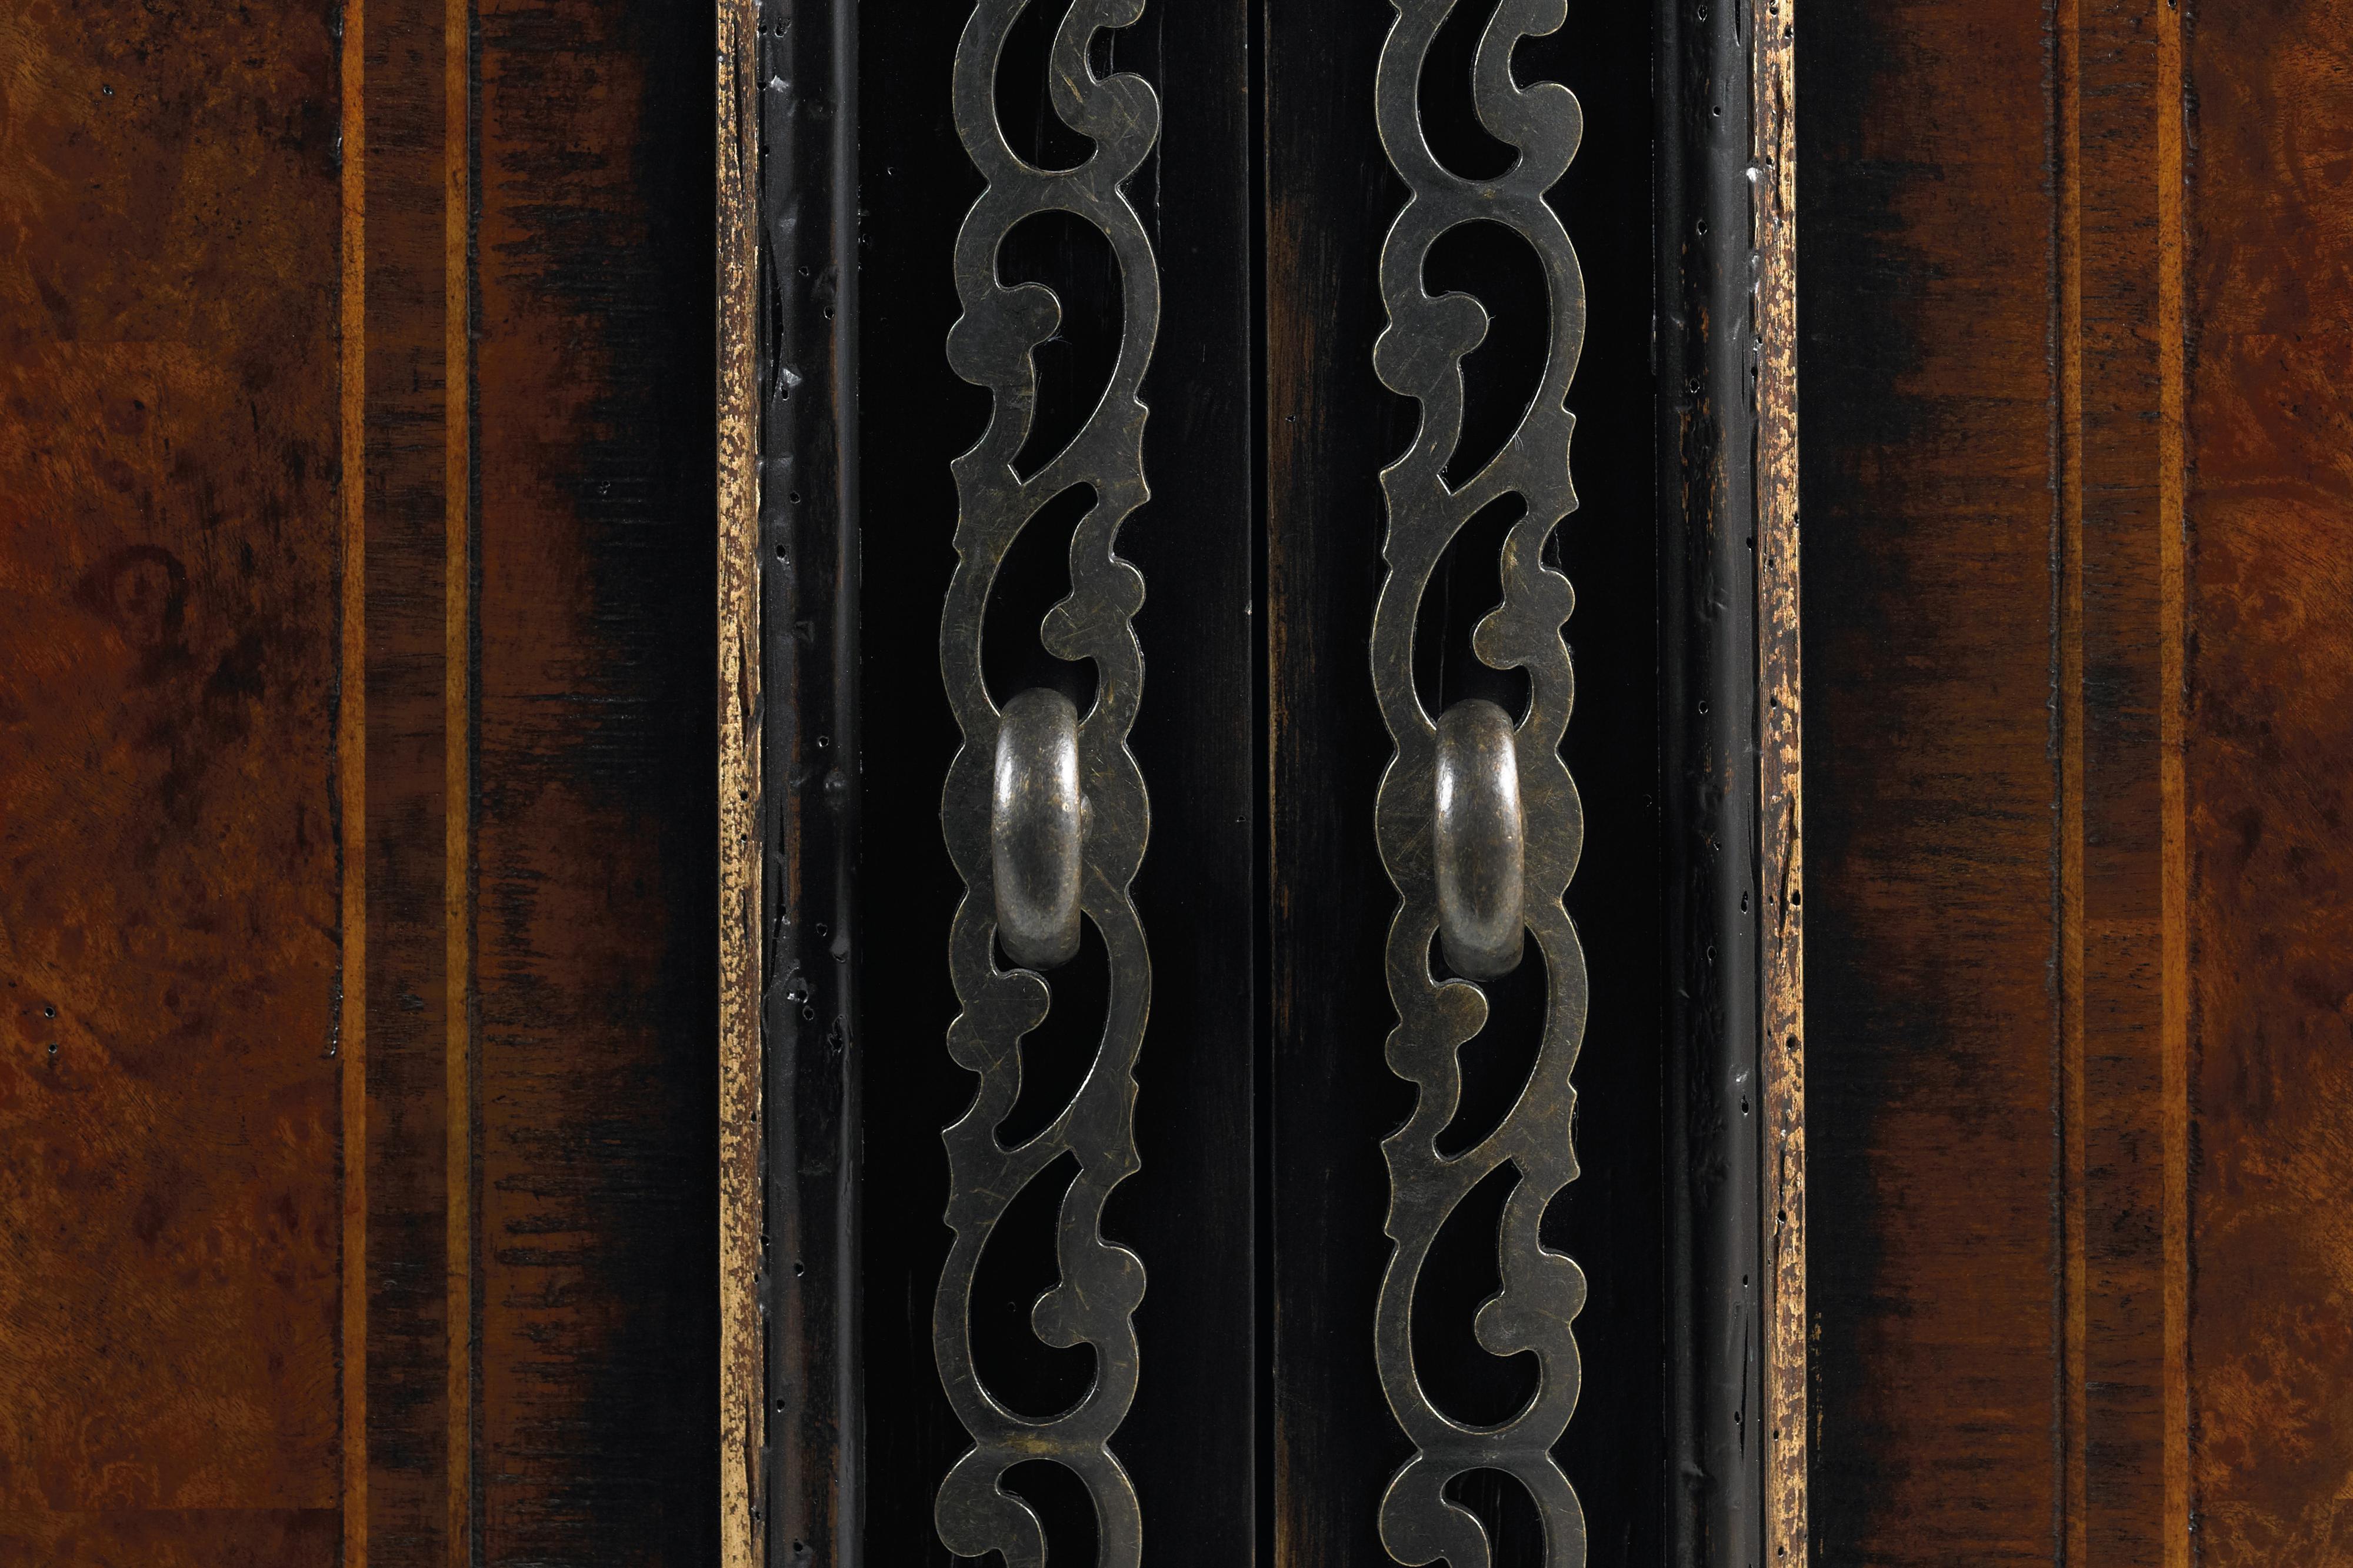 Hooker Furniture Grandover fice Credenza with Locking File